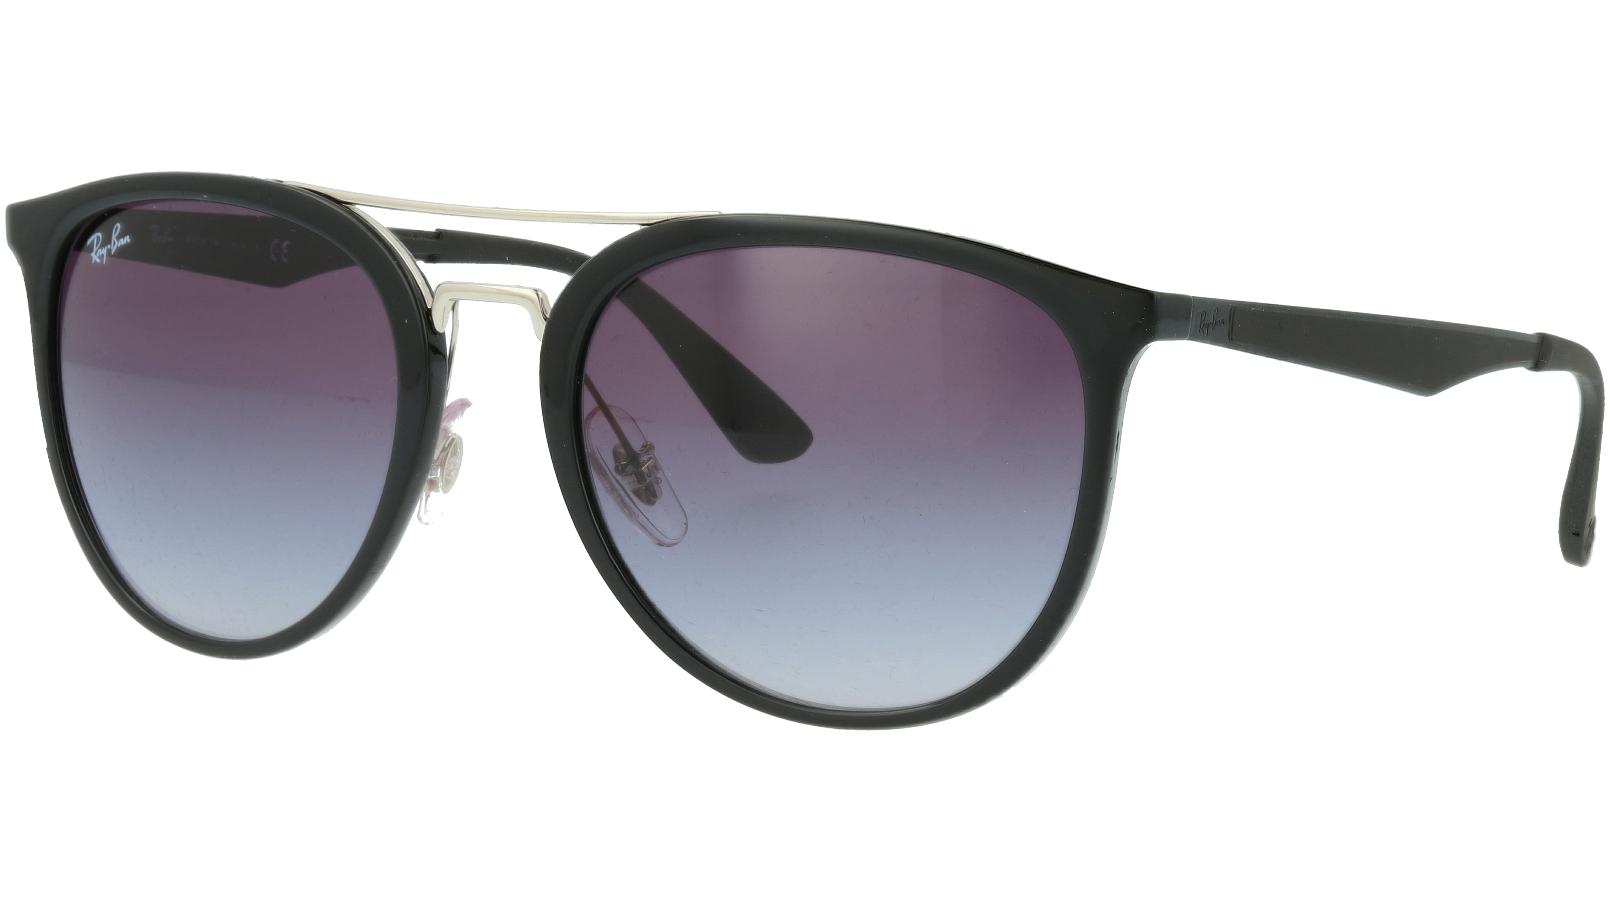 Ray-Ban RB4285 601/8G 55 BLACK Sunglasses